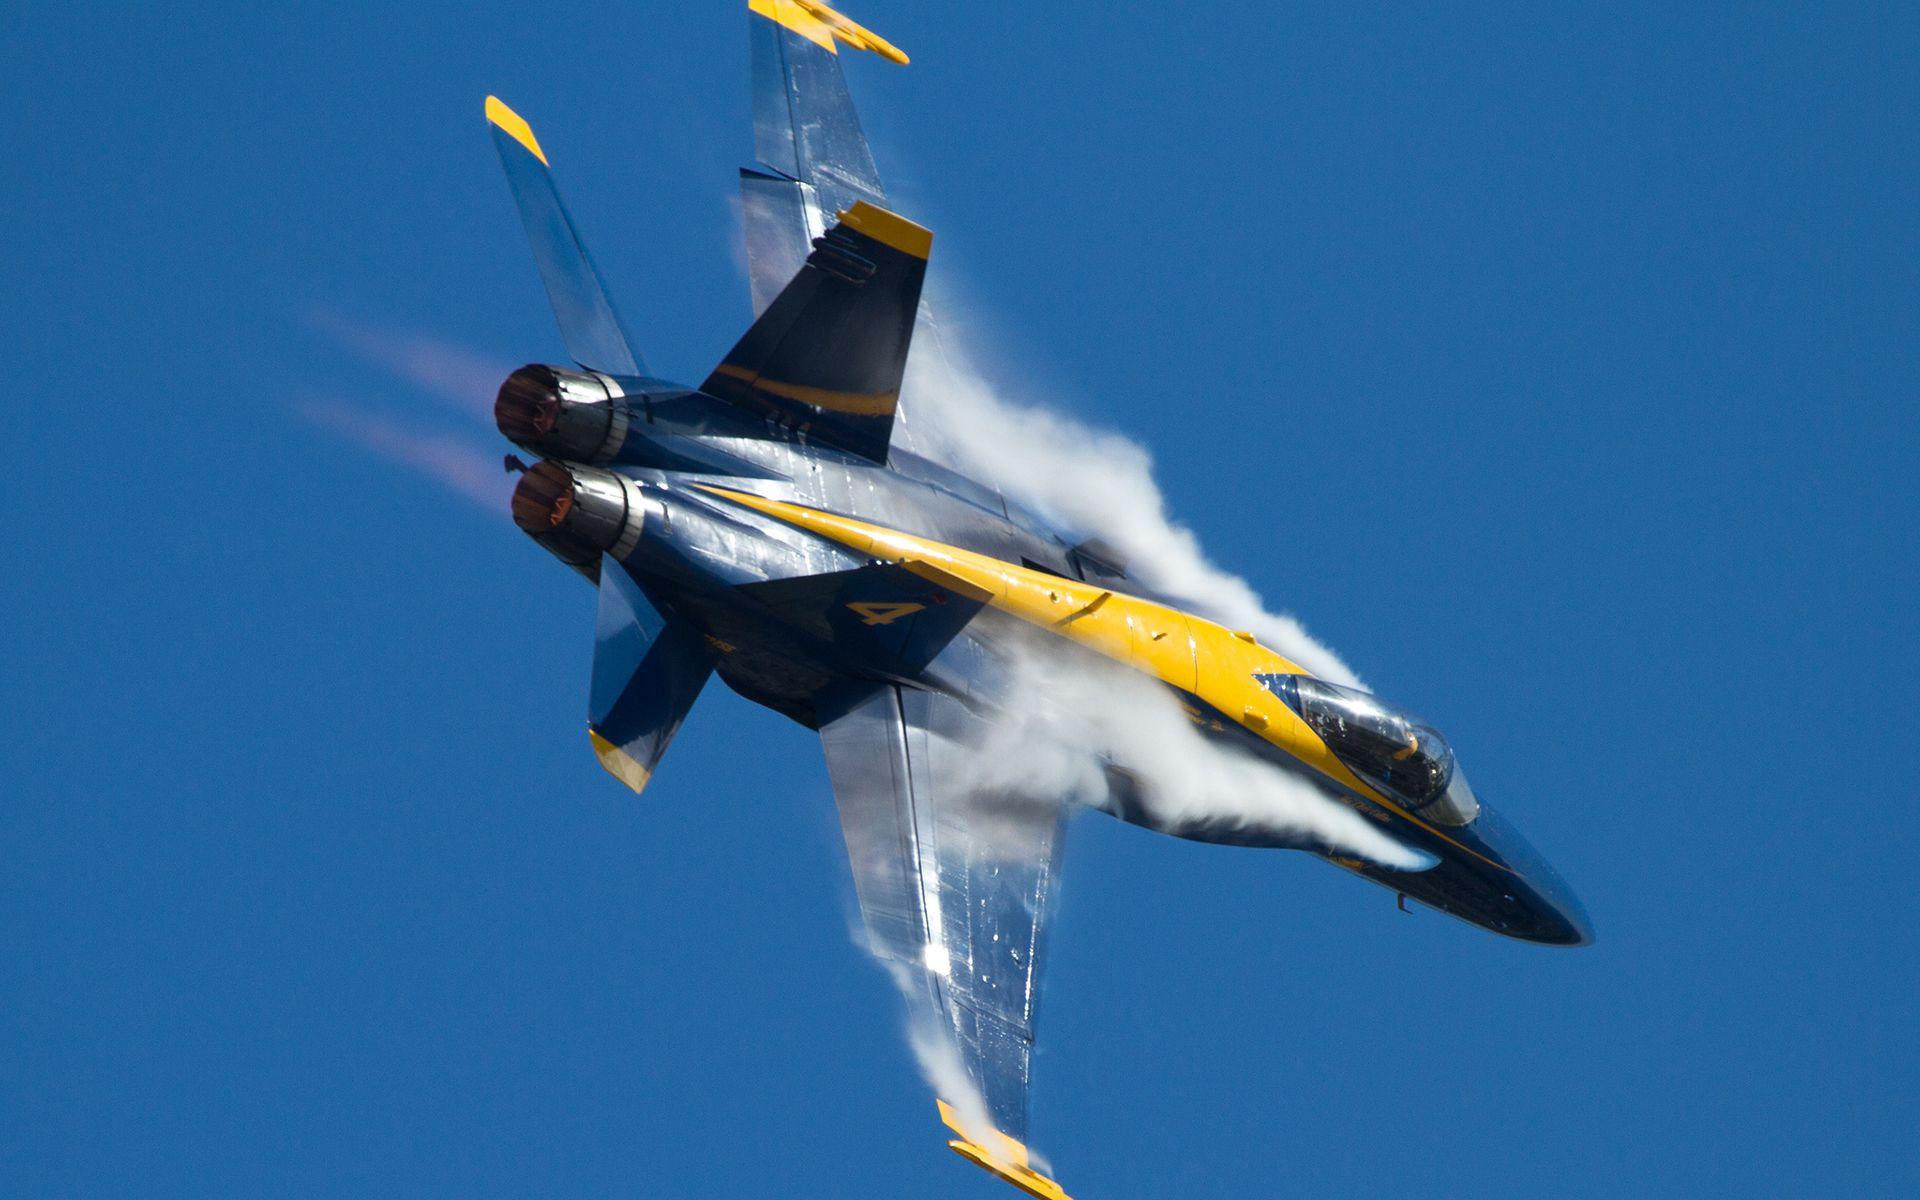 blue angels wallpaper  Blue Angels wallpaper | Jet Blue Angels military sky wallpaper ...